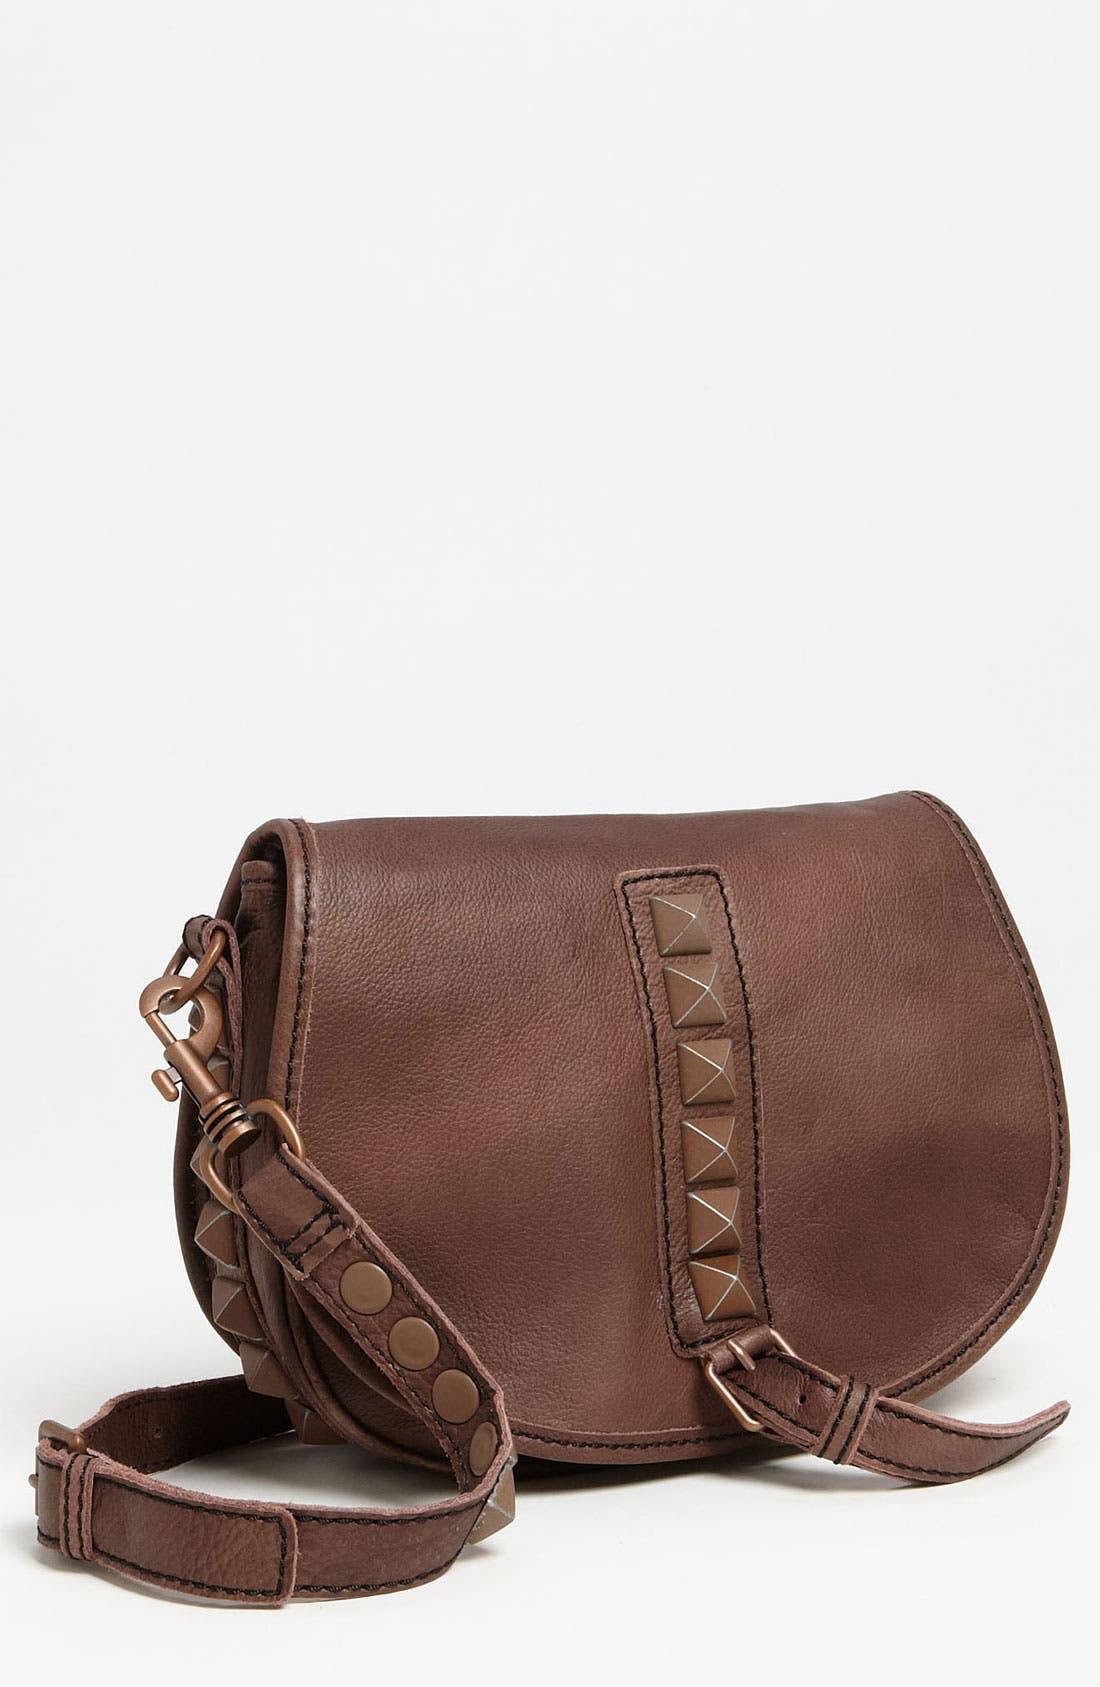 Main Image - Liebeskind 'Filipa' Leather Crossbody Bag